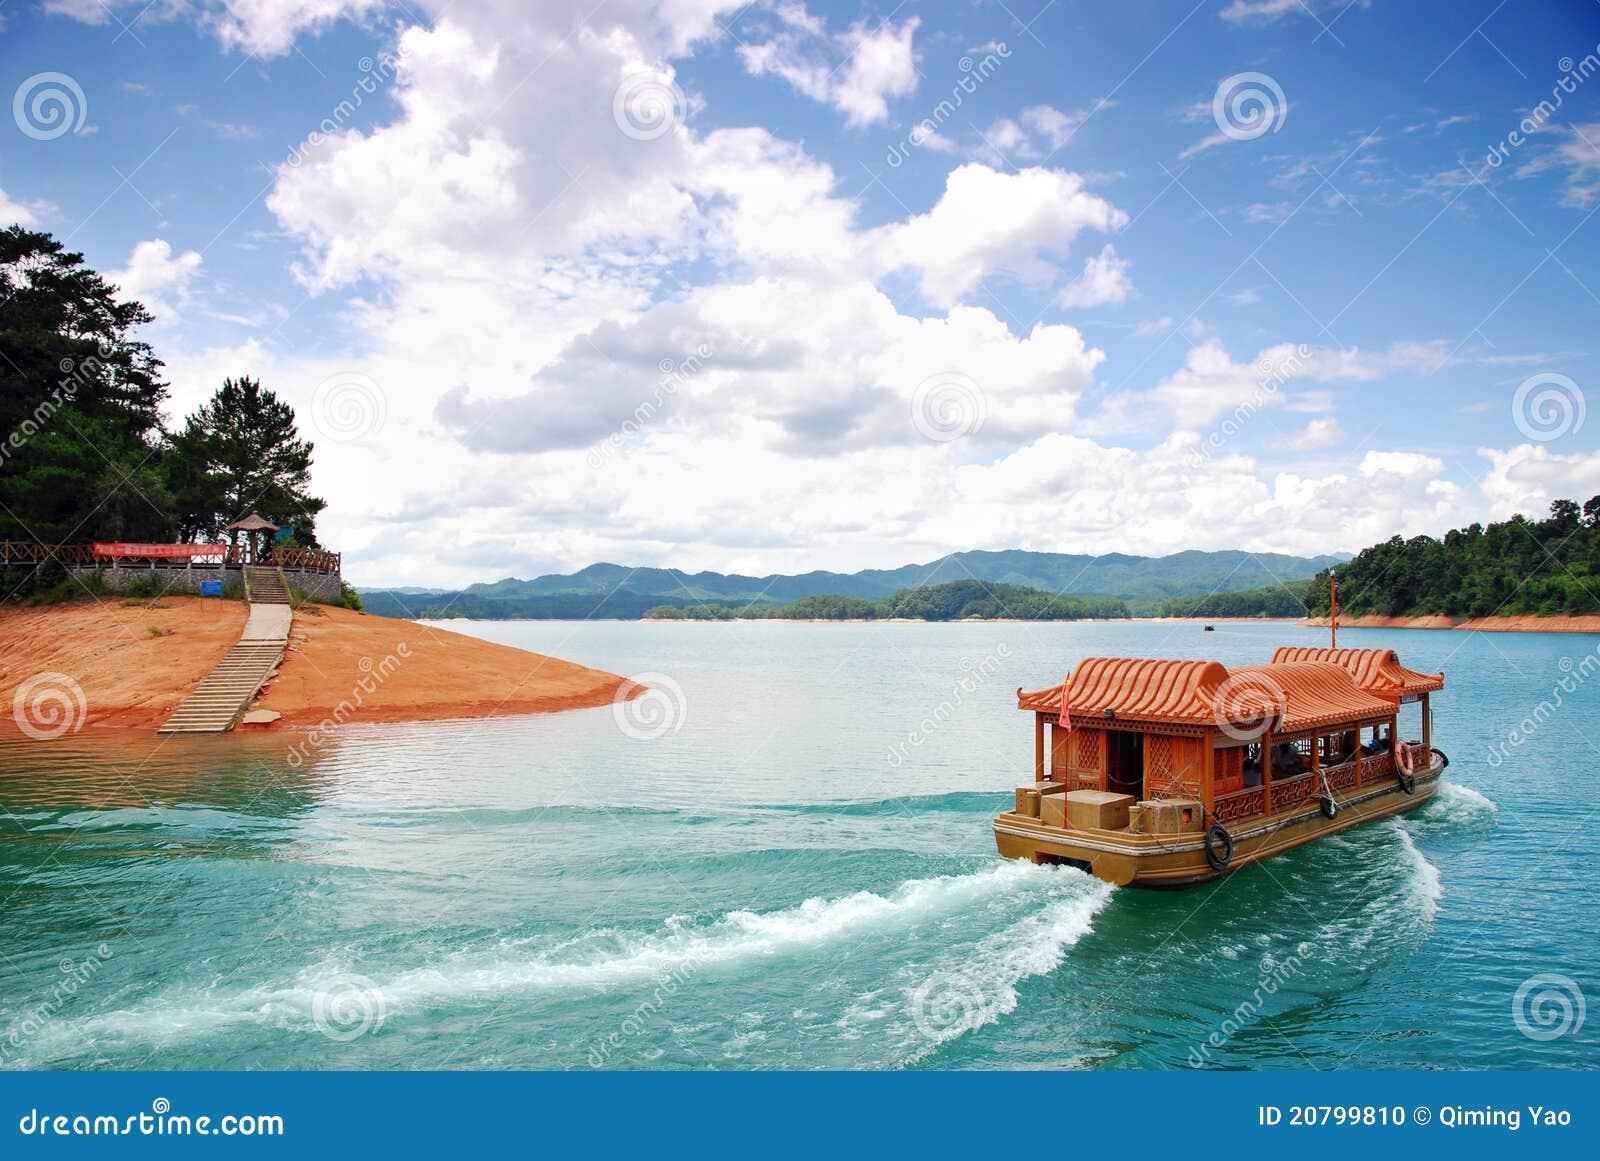 Barco e céu azul